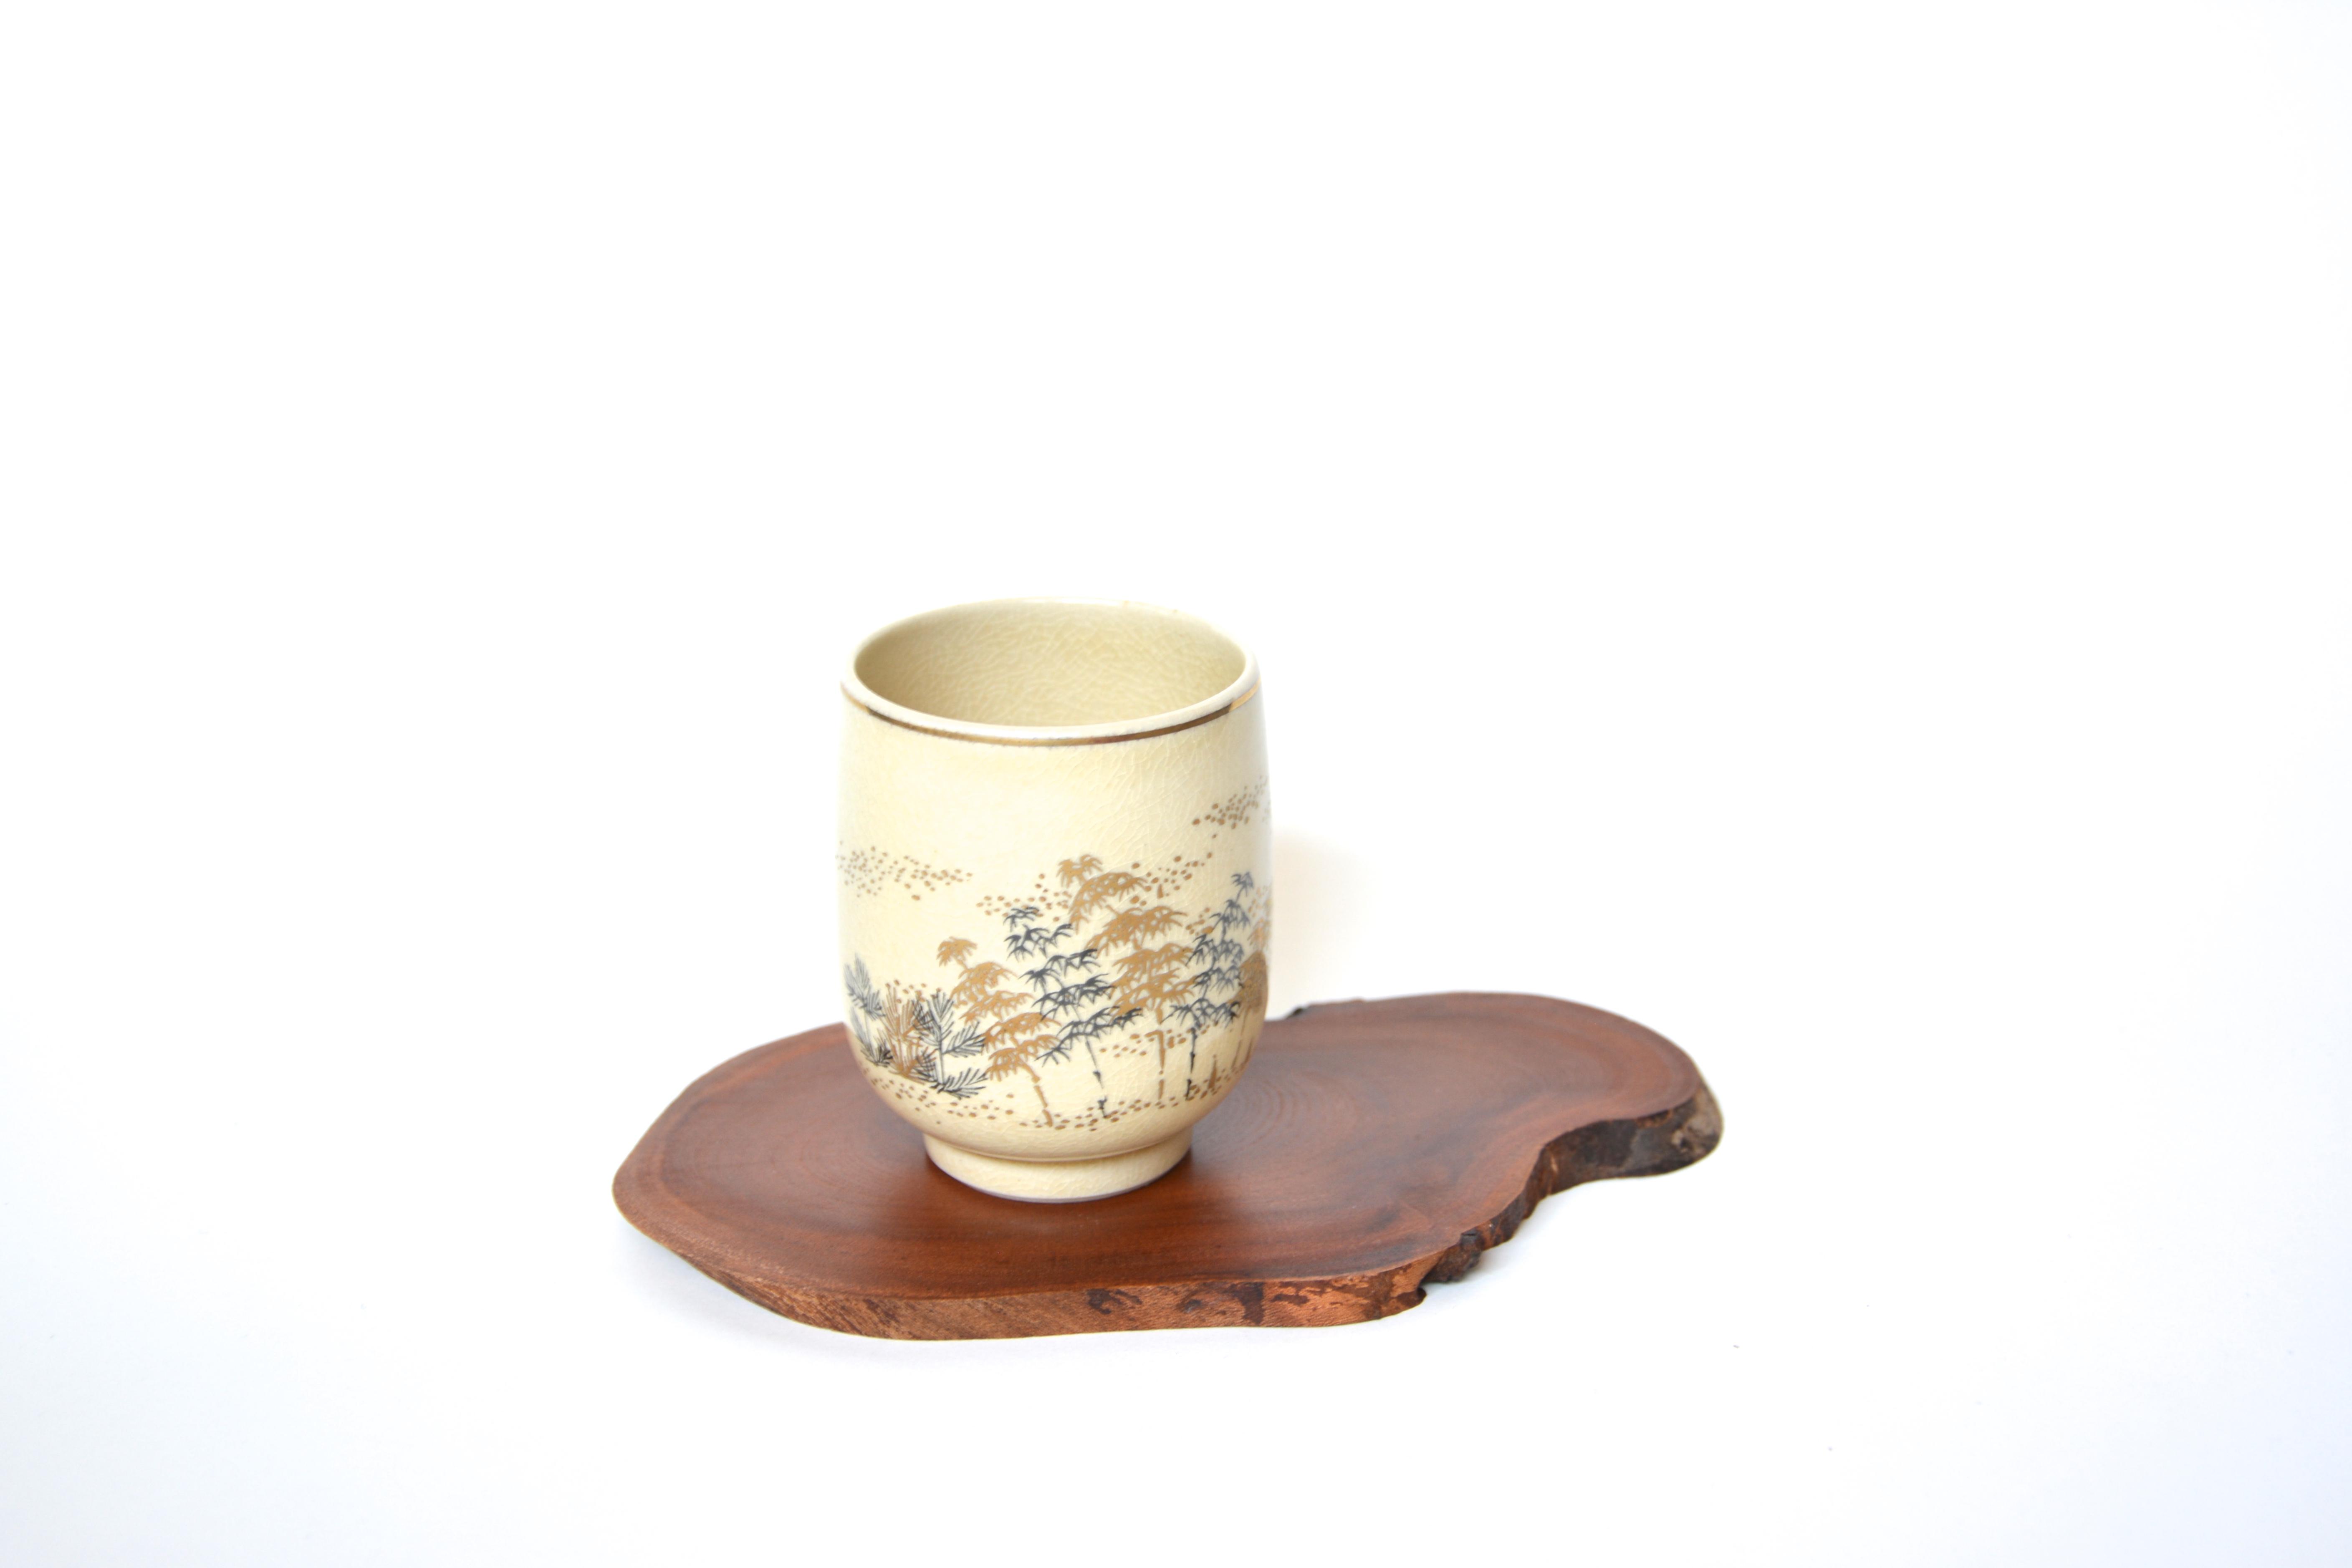 Satsuma-Keramik Teebecher